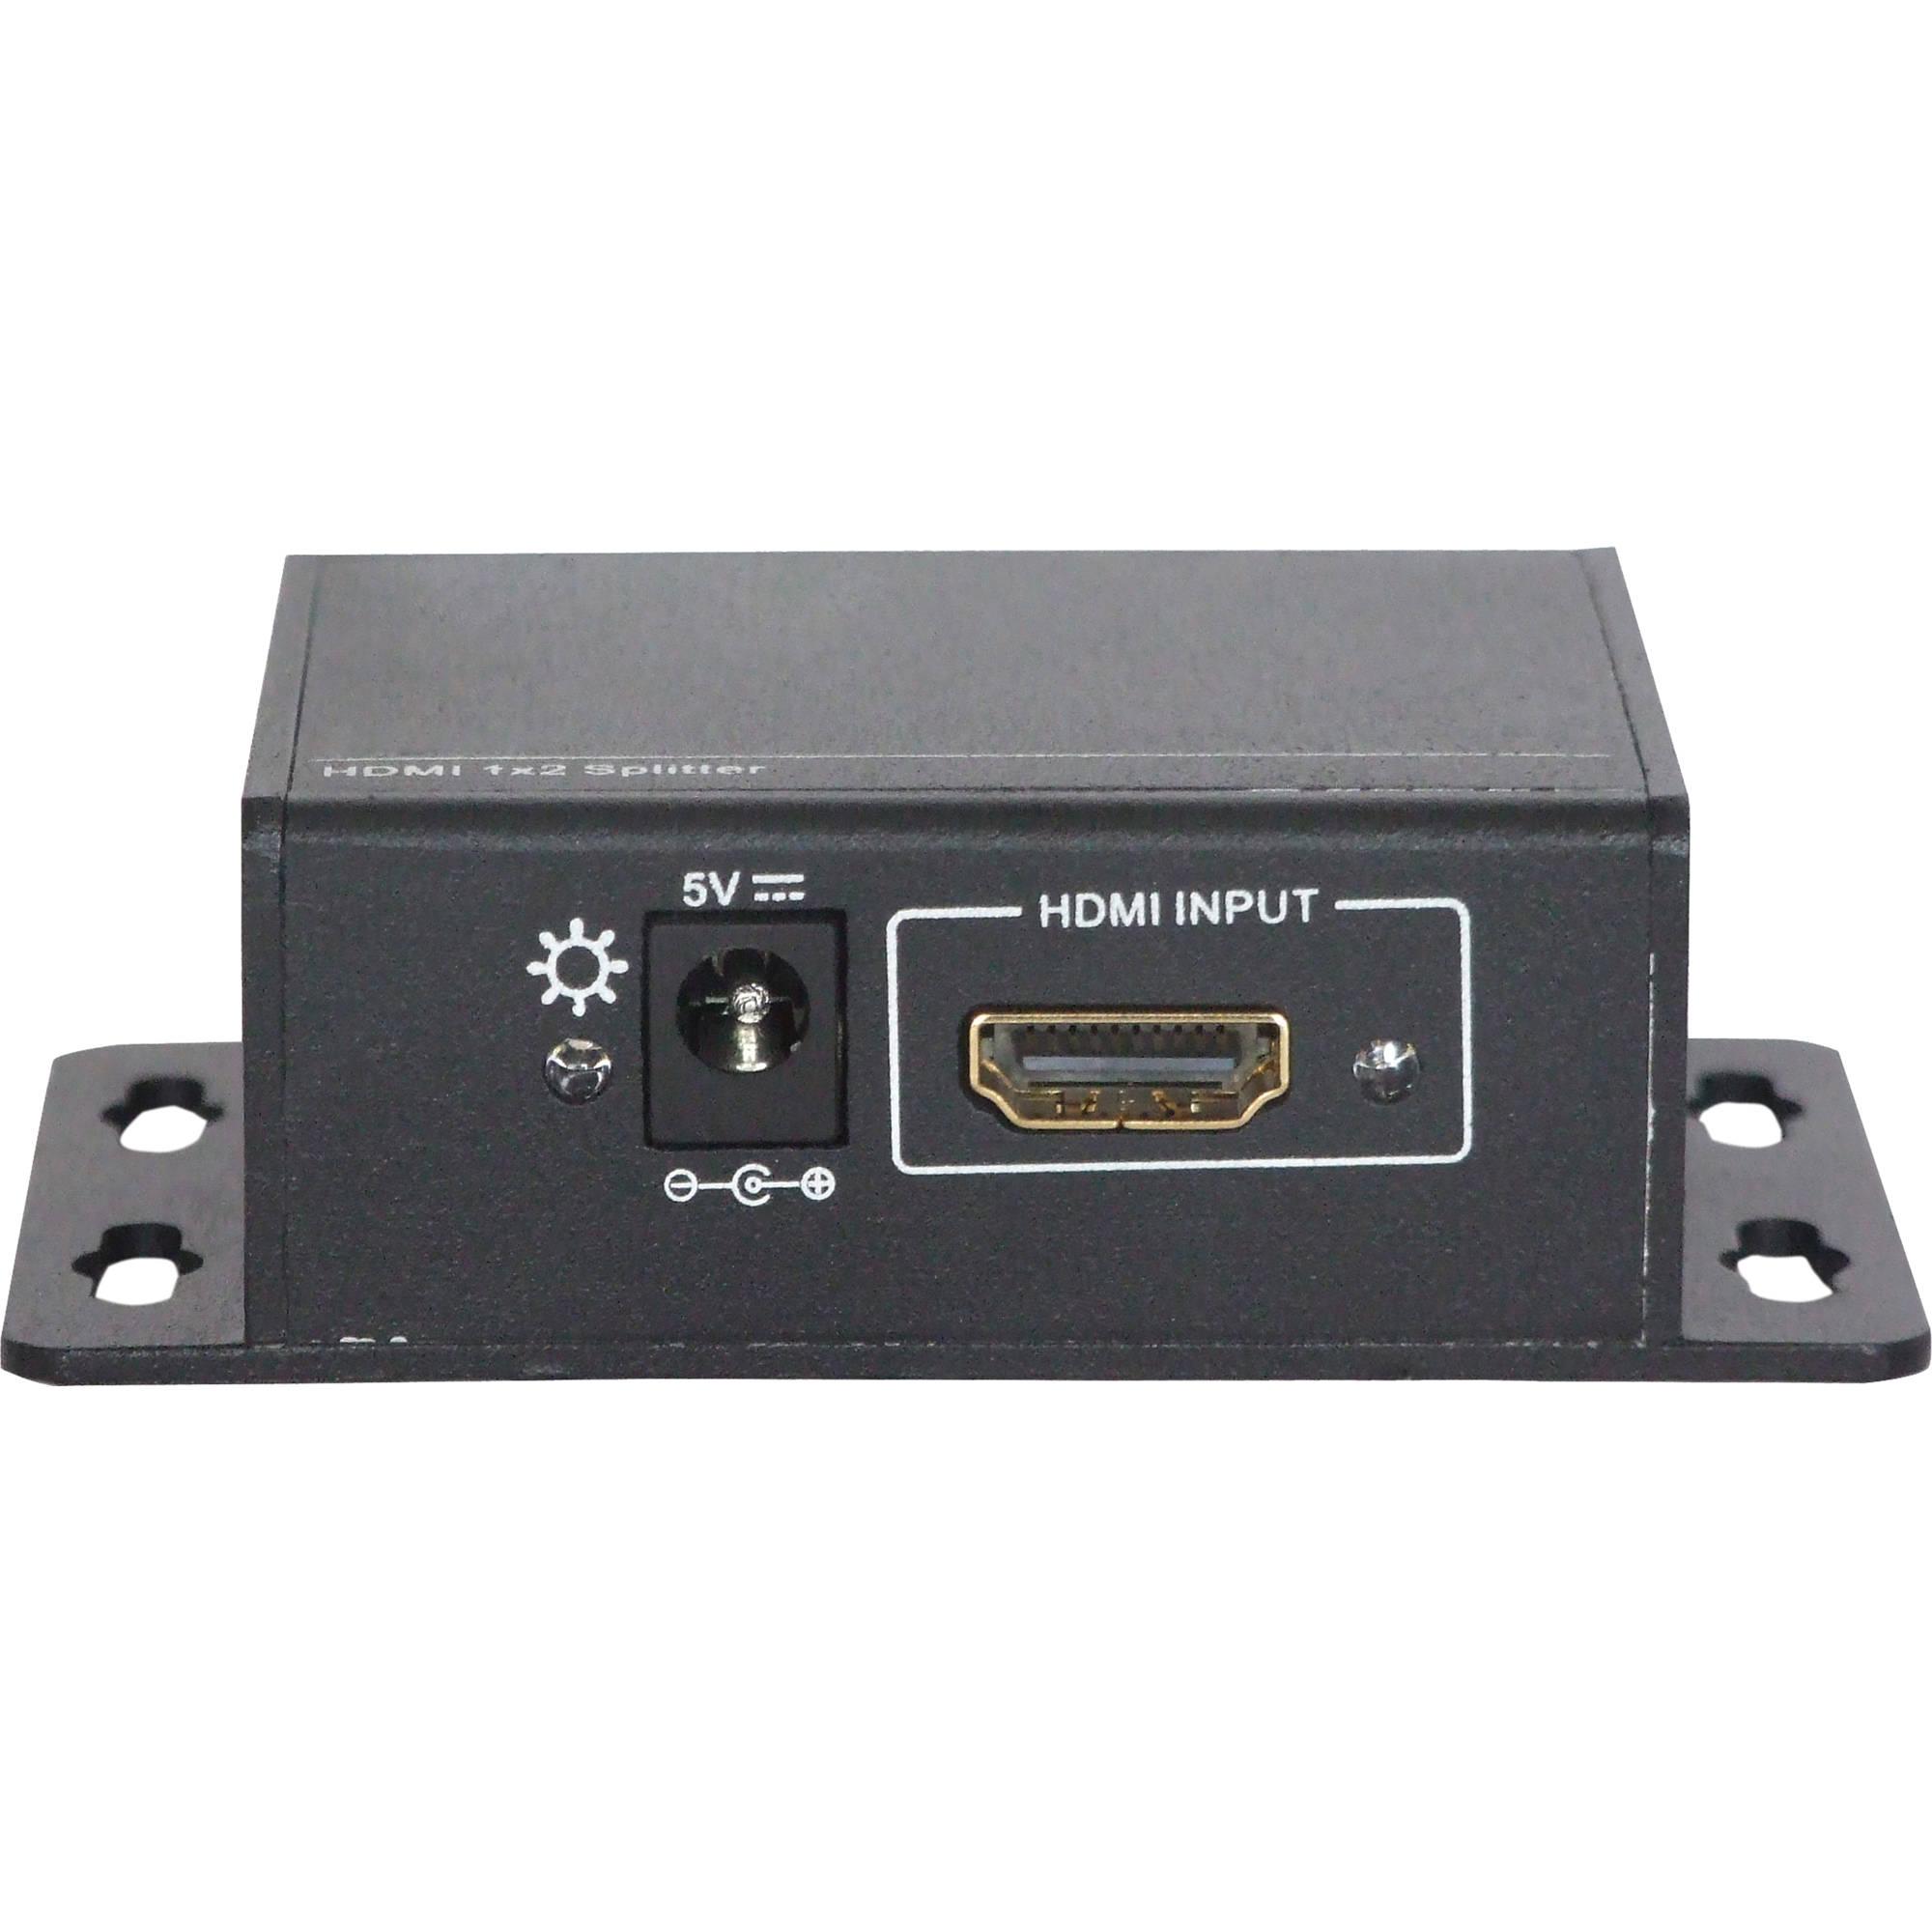 Aurora Multimedia 1 x 2 HDMI UHD 4K Distribution ASP-12H-4K B&H